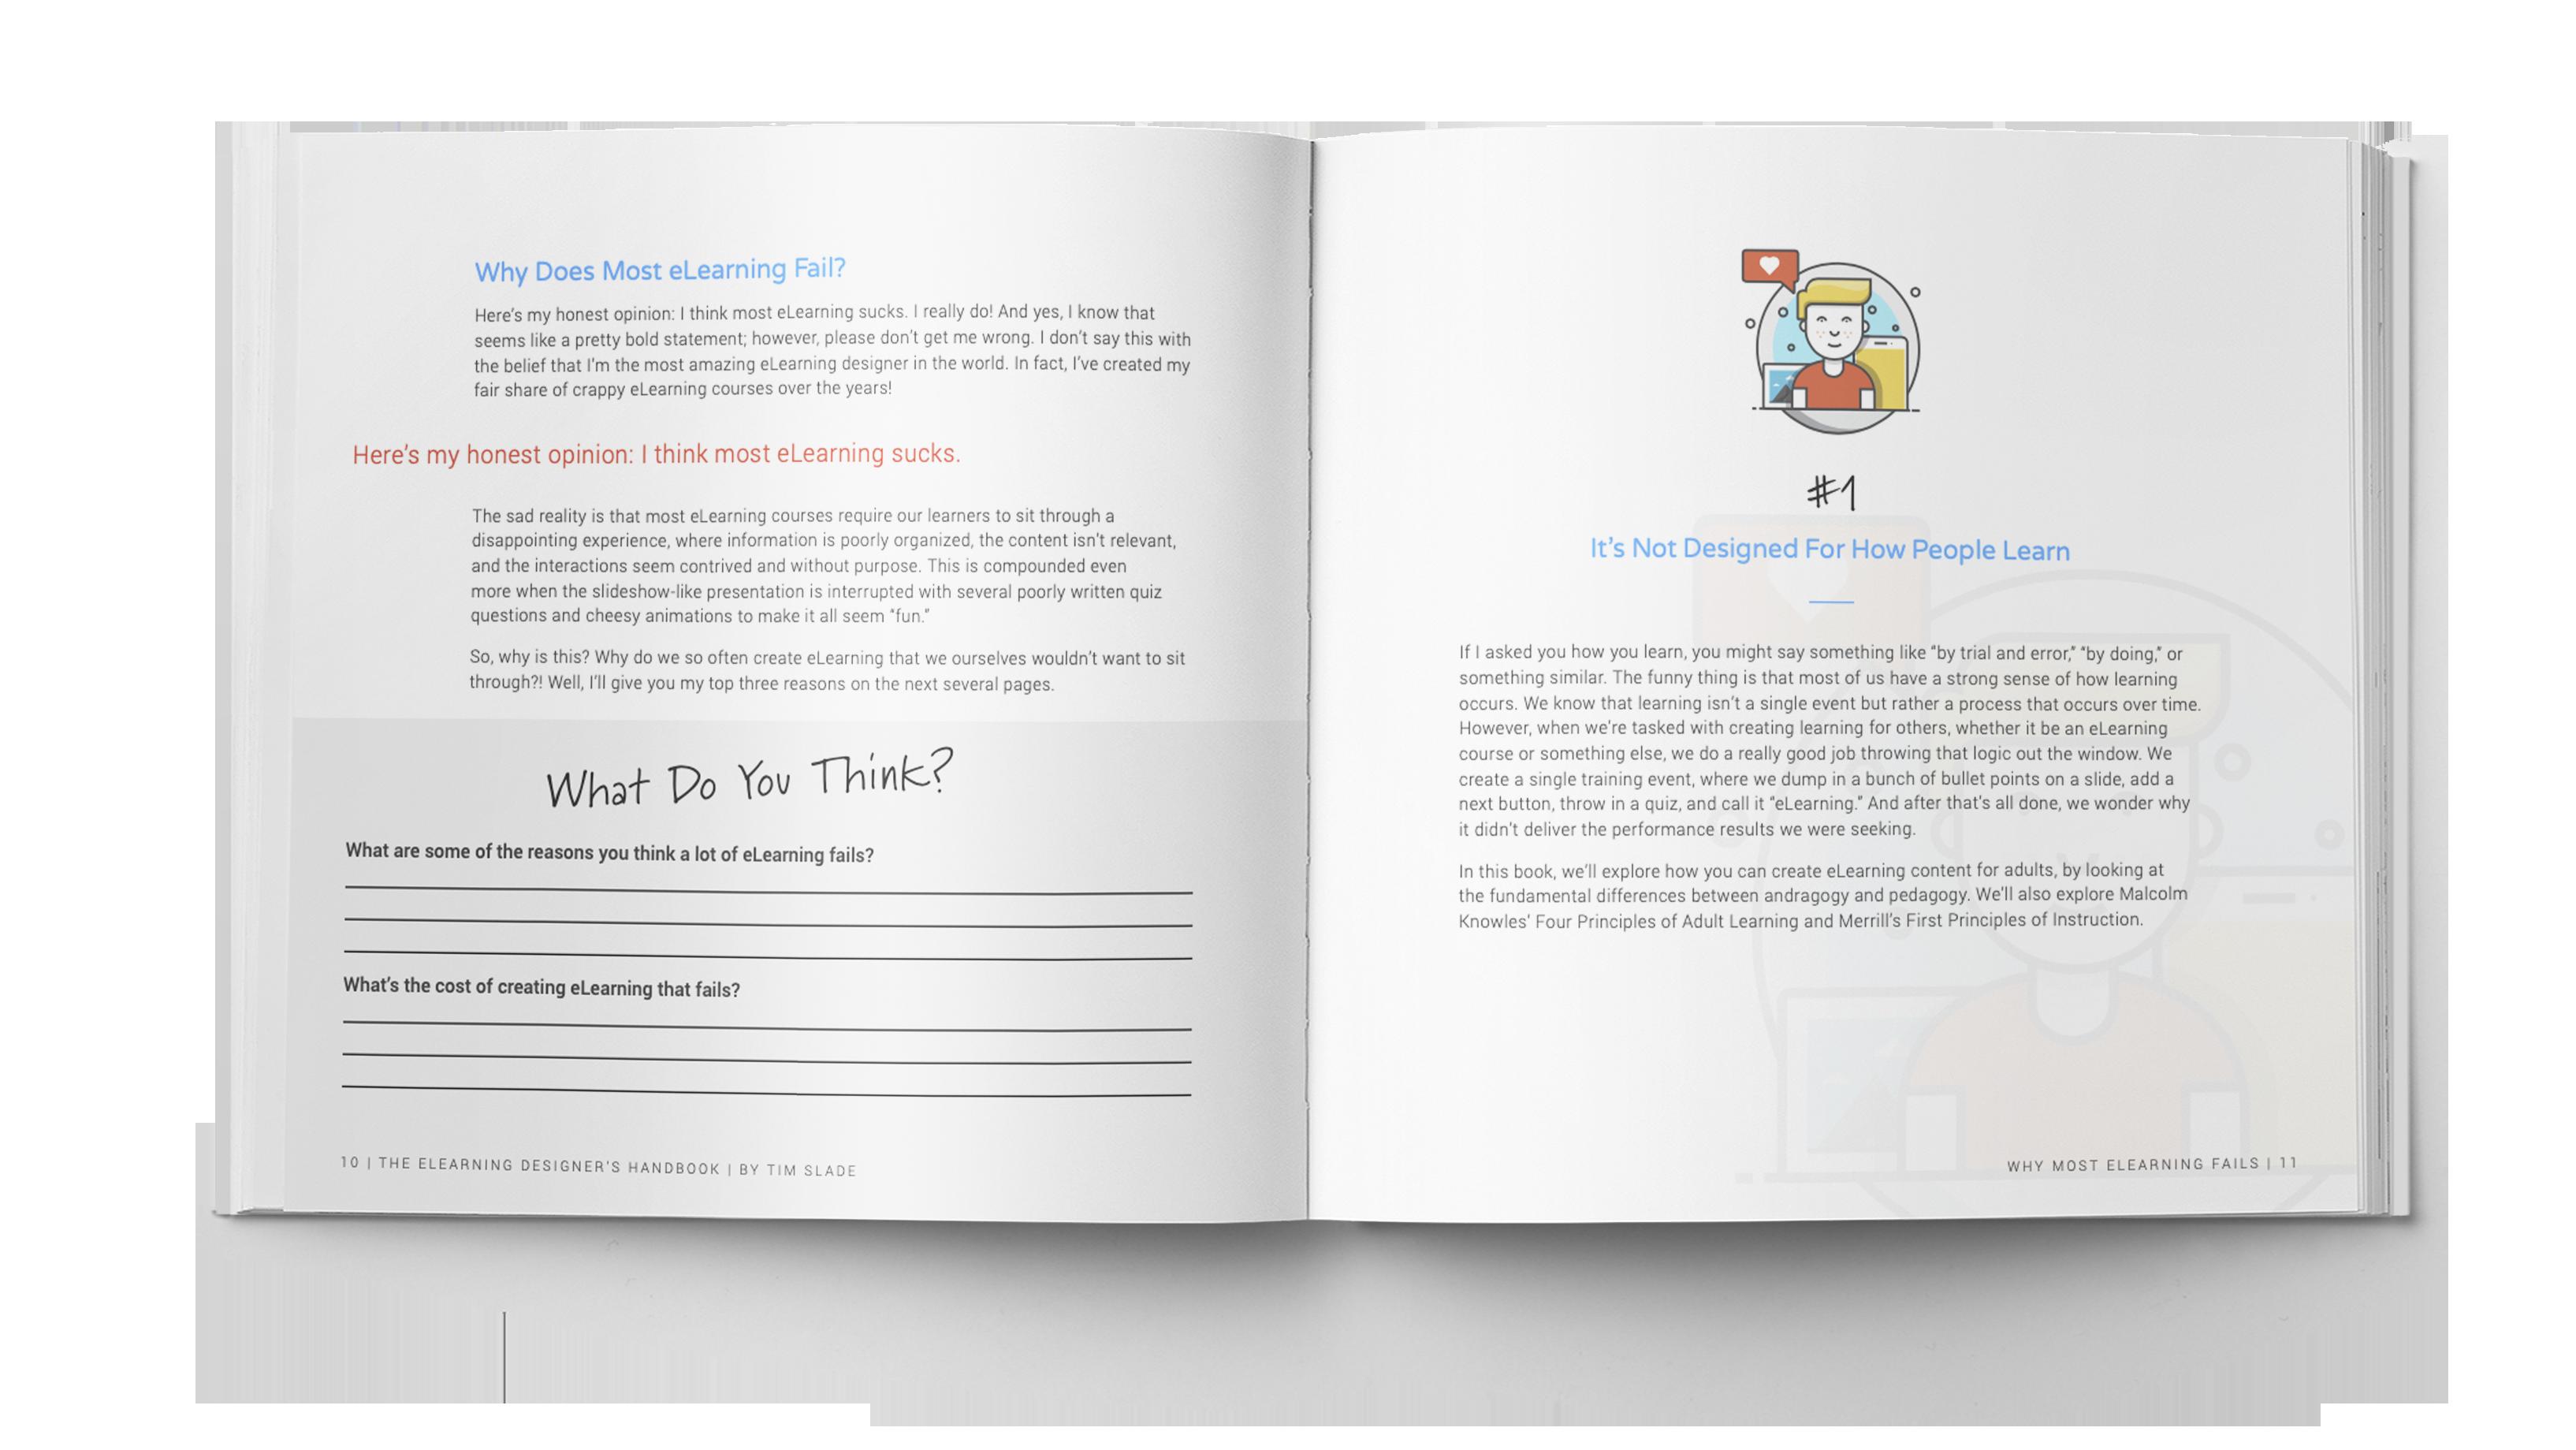 The eLearning Designer's Handbook by Tim Slade | Why Most eLearning Fails | Freelance eLearning Designer | The eLearning Designer's Academy